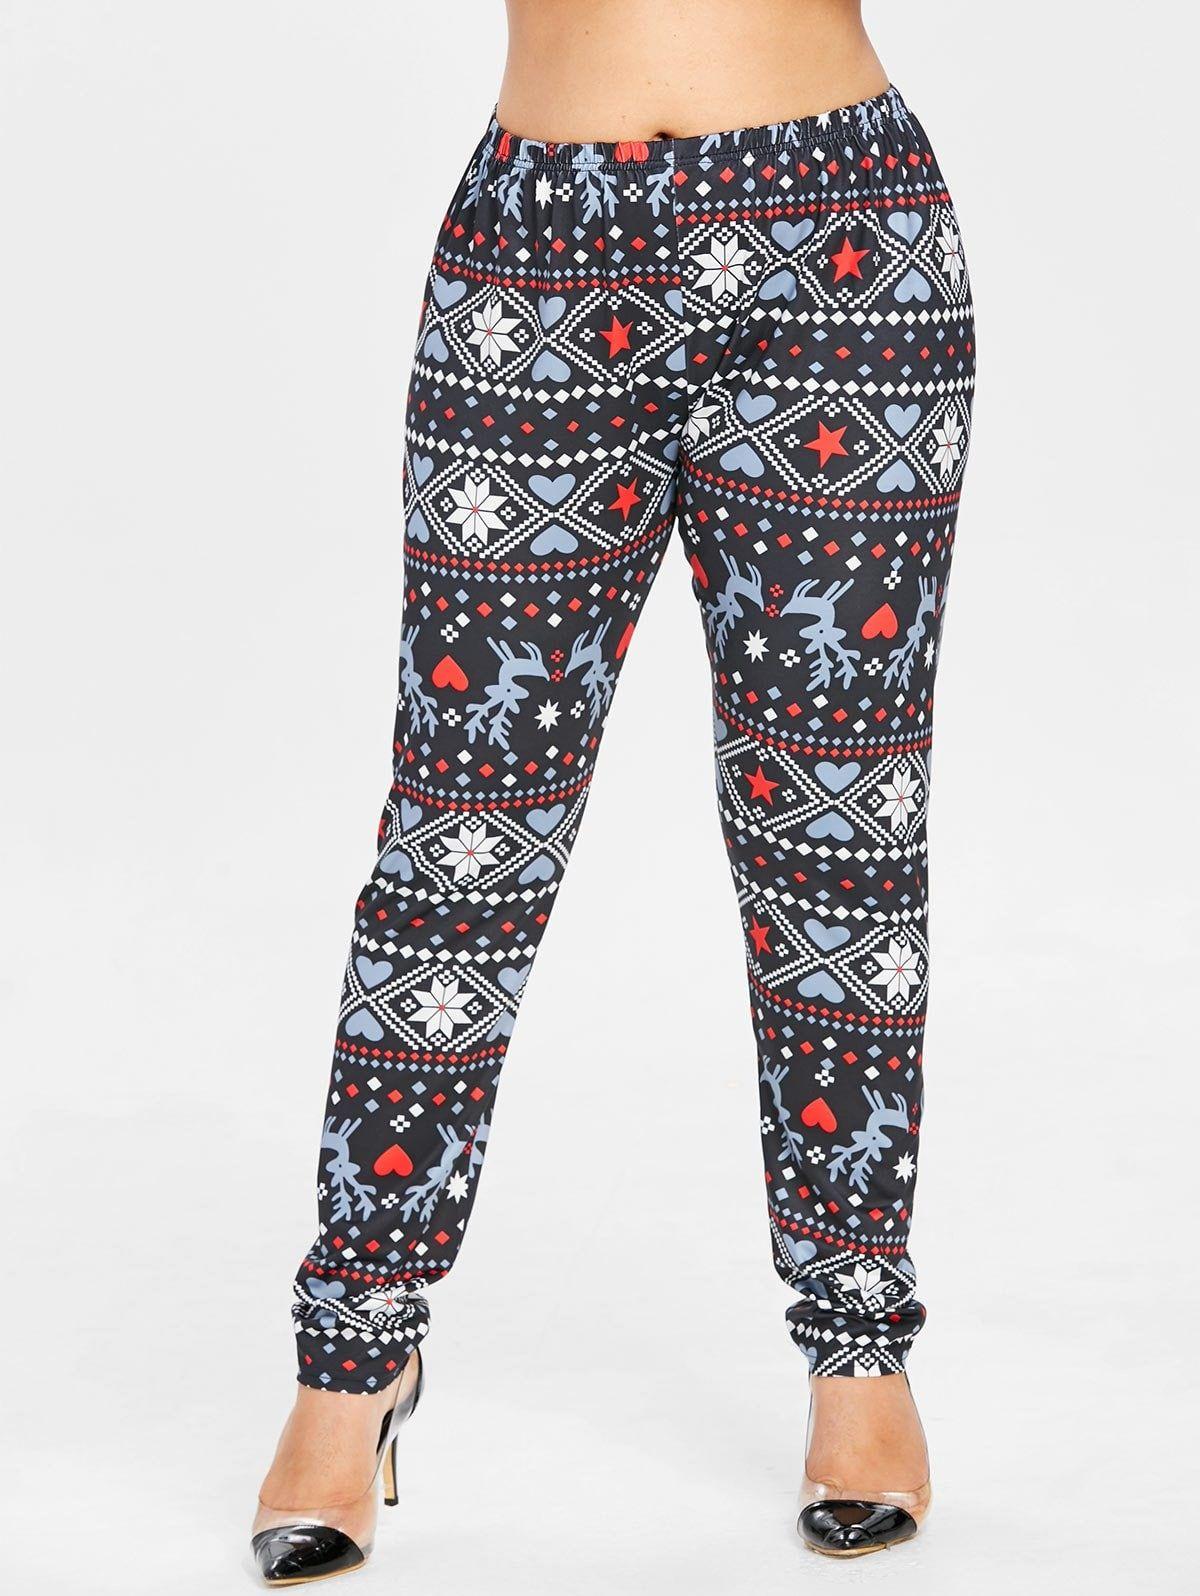 7879f0dfa58453 Plus Size Elk Christmas Leggings in 2019 | Plus Size Fashion ...